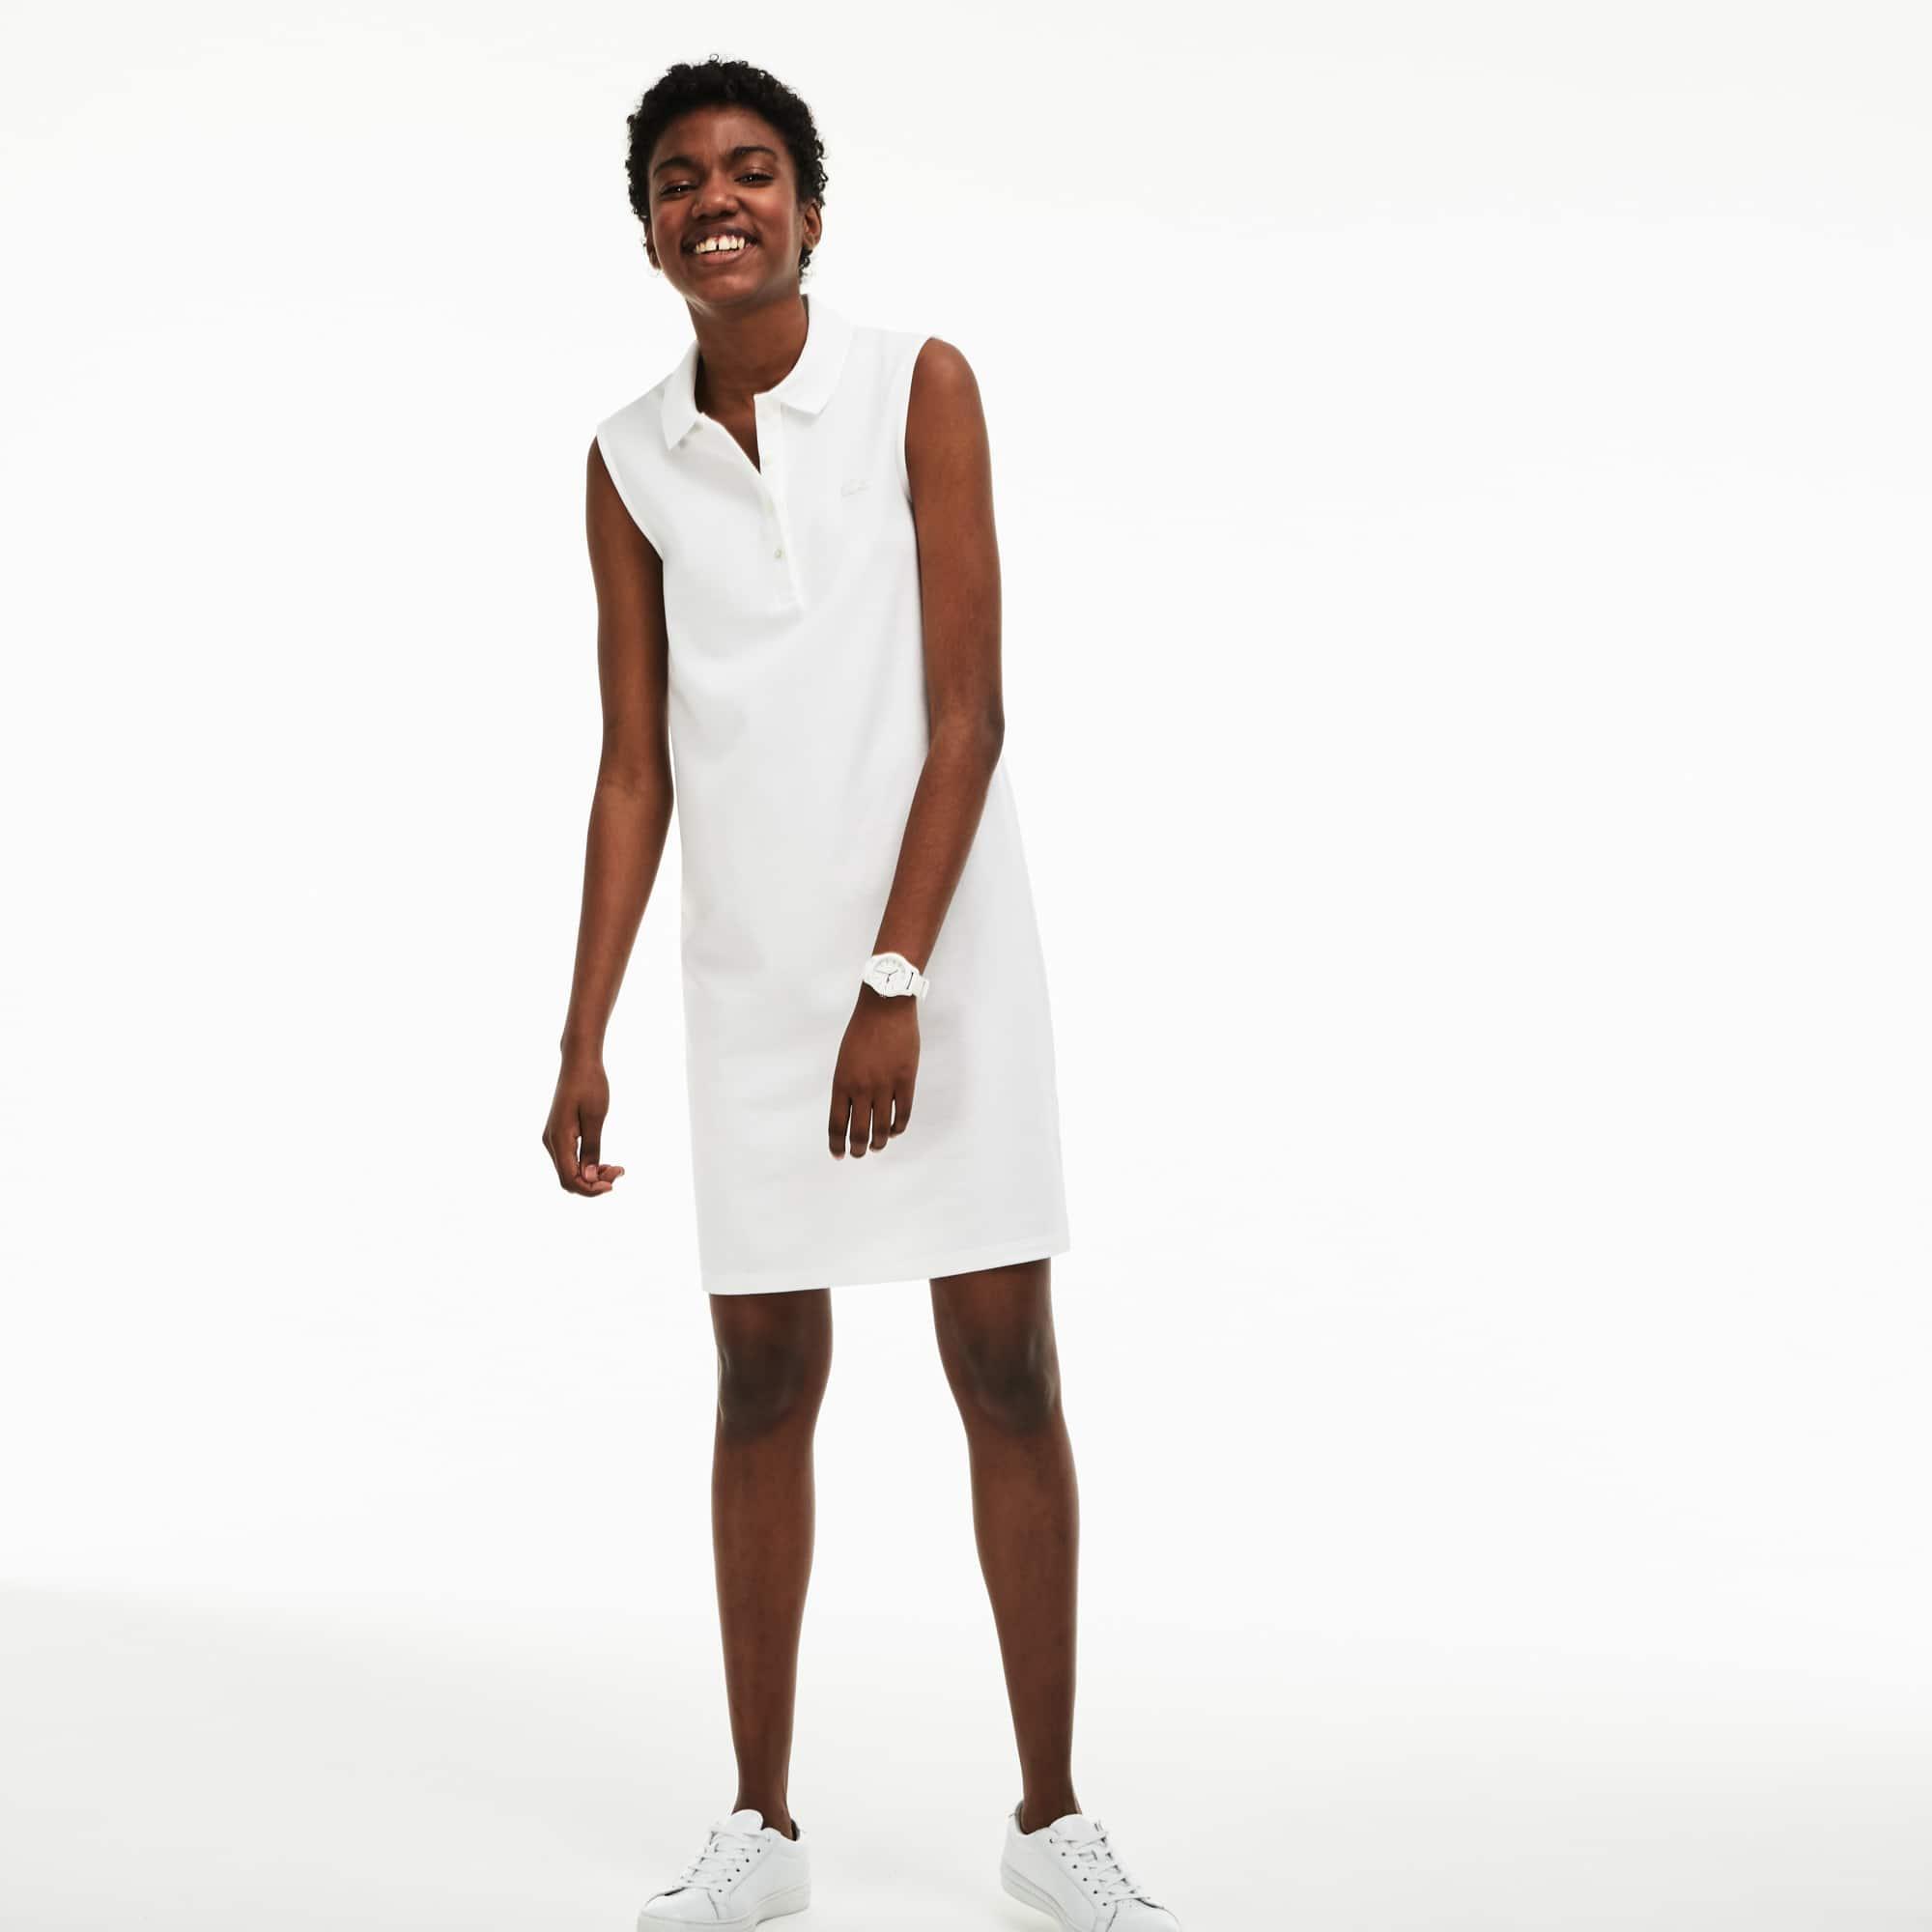 ce567bcf5789f2 New. Women s Micro Piqué Polo Dress